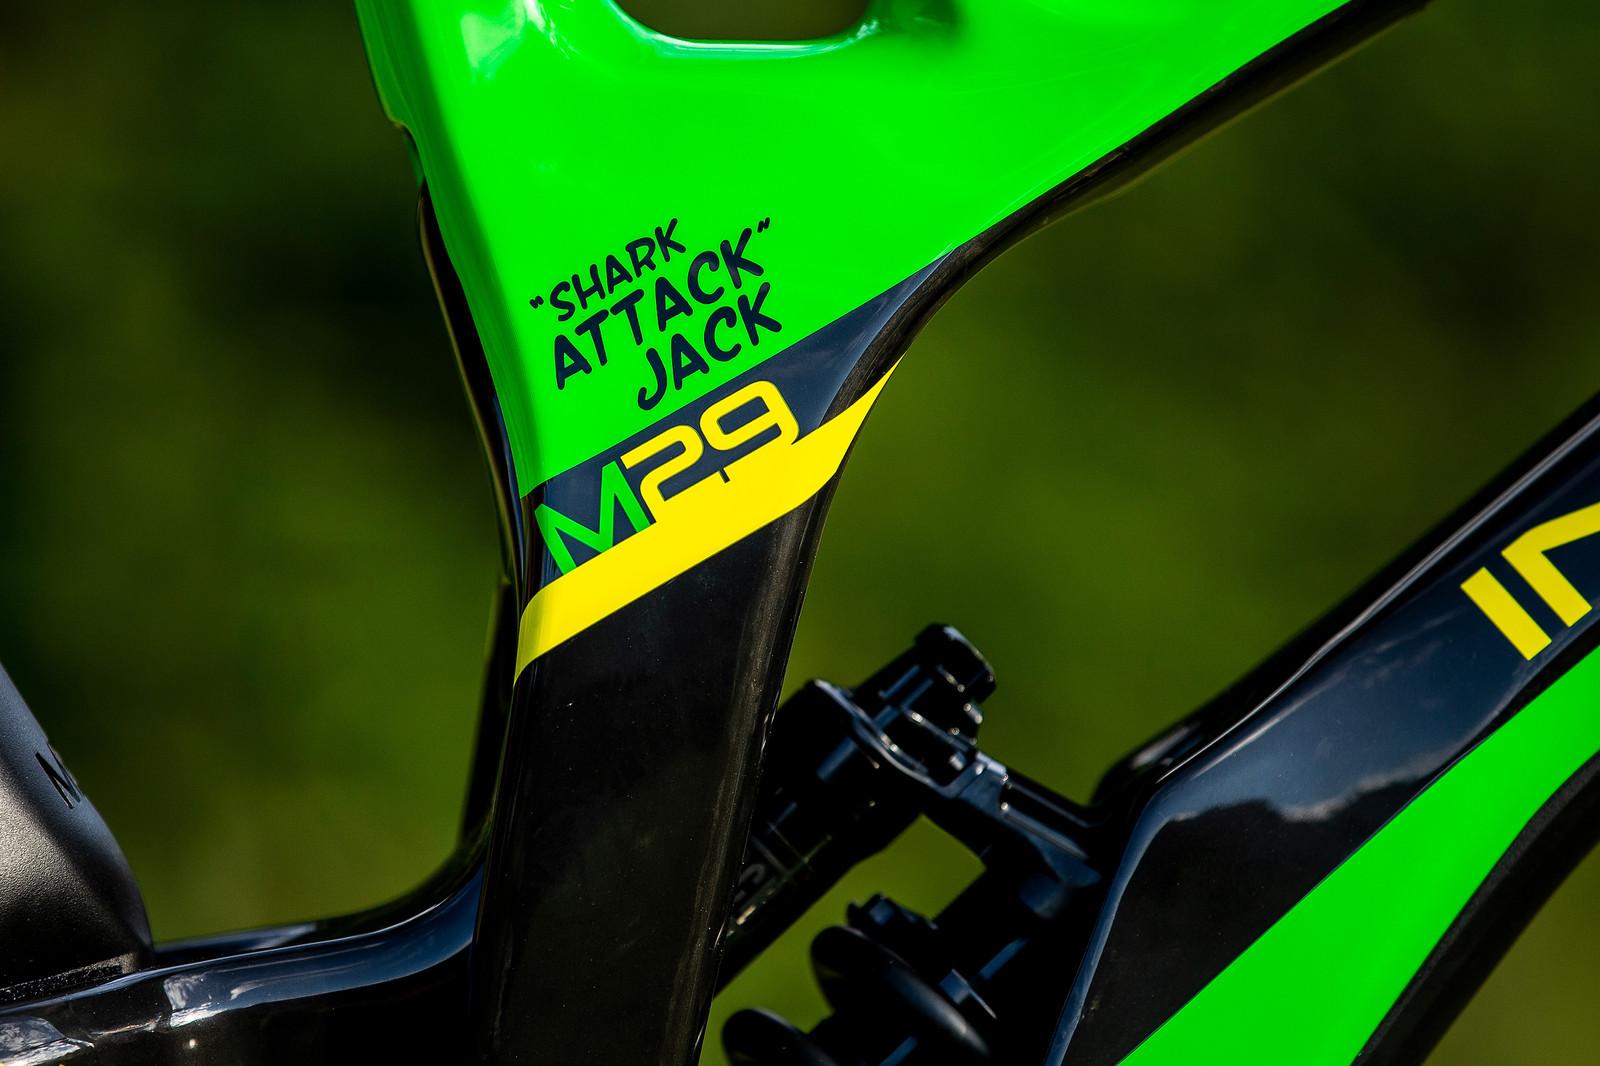 Shark Attack - WORLD CHAMPS BIKE - Jack Moir's Intense M29 - Mountain Biking Pictures - Vital MTB